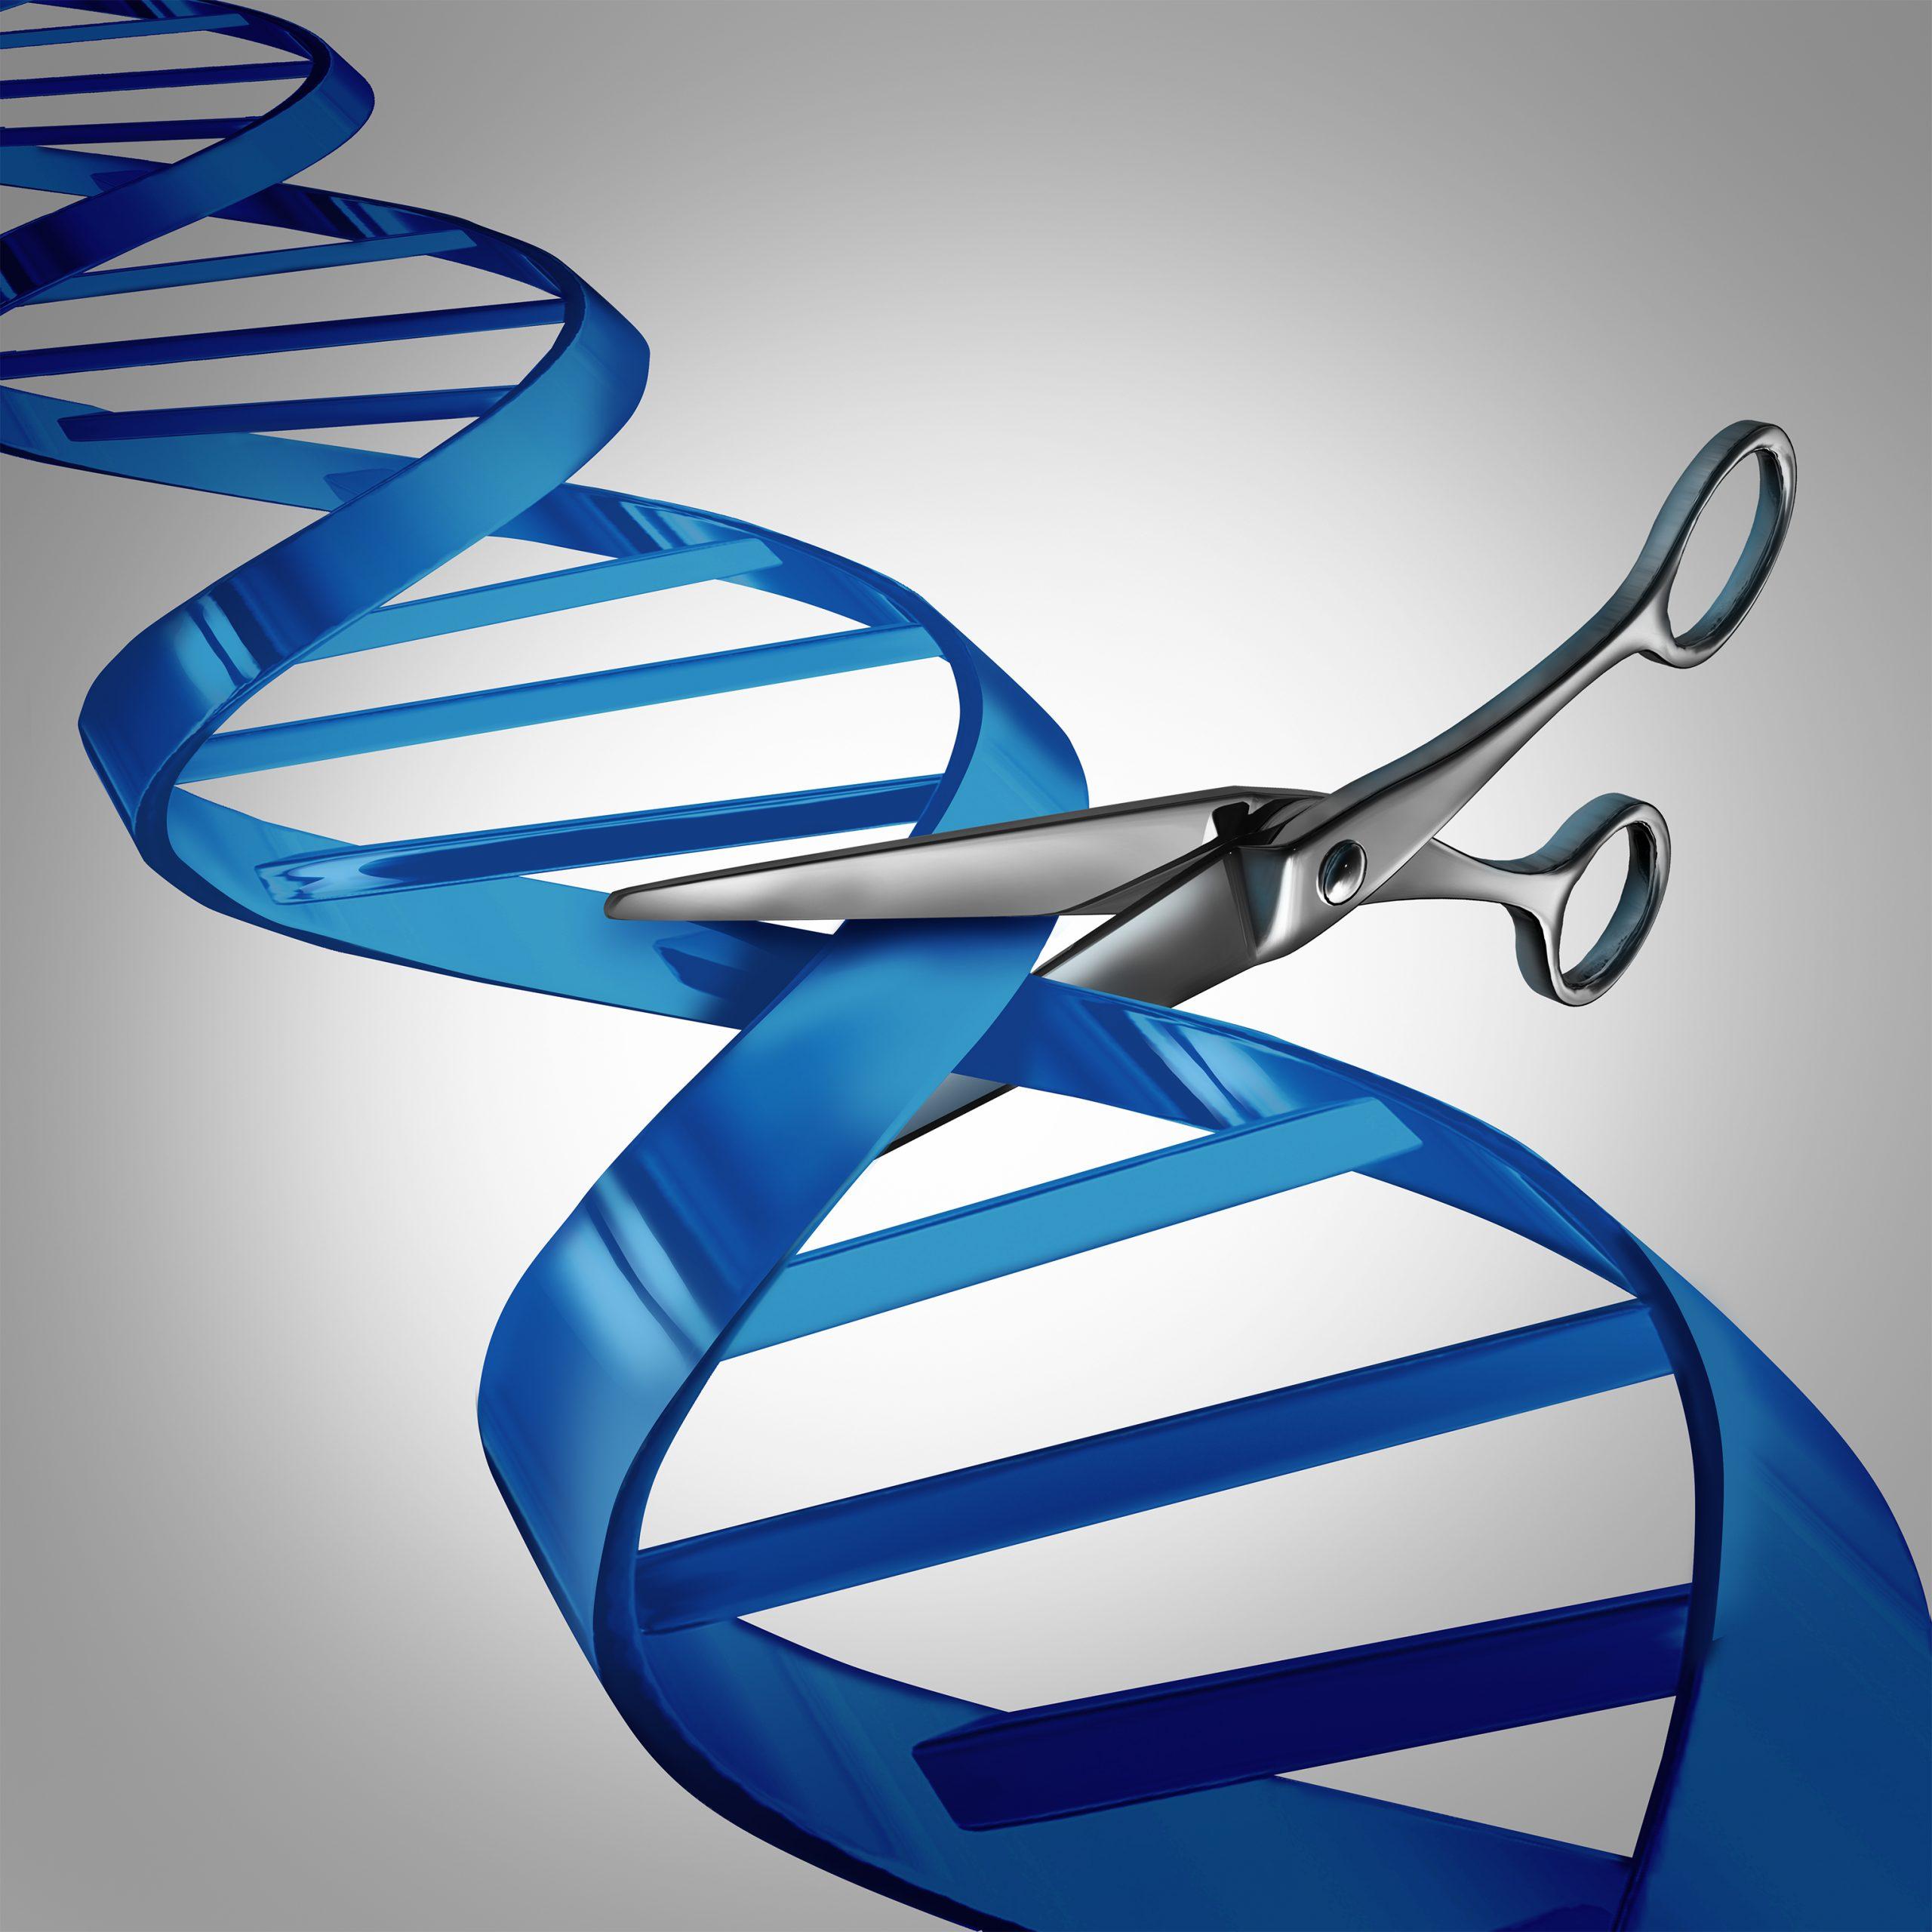 CRISPR, gene editing - https://depositphotos.com/79981696/stock-photo-gene-editing.html